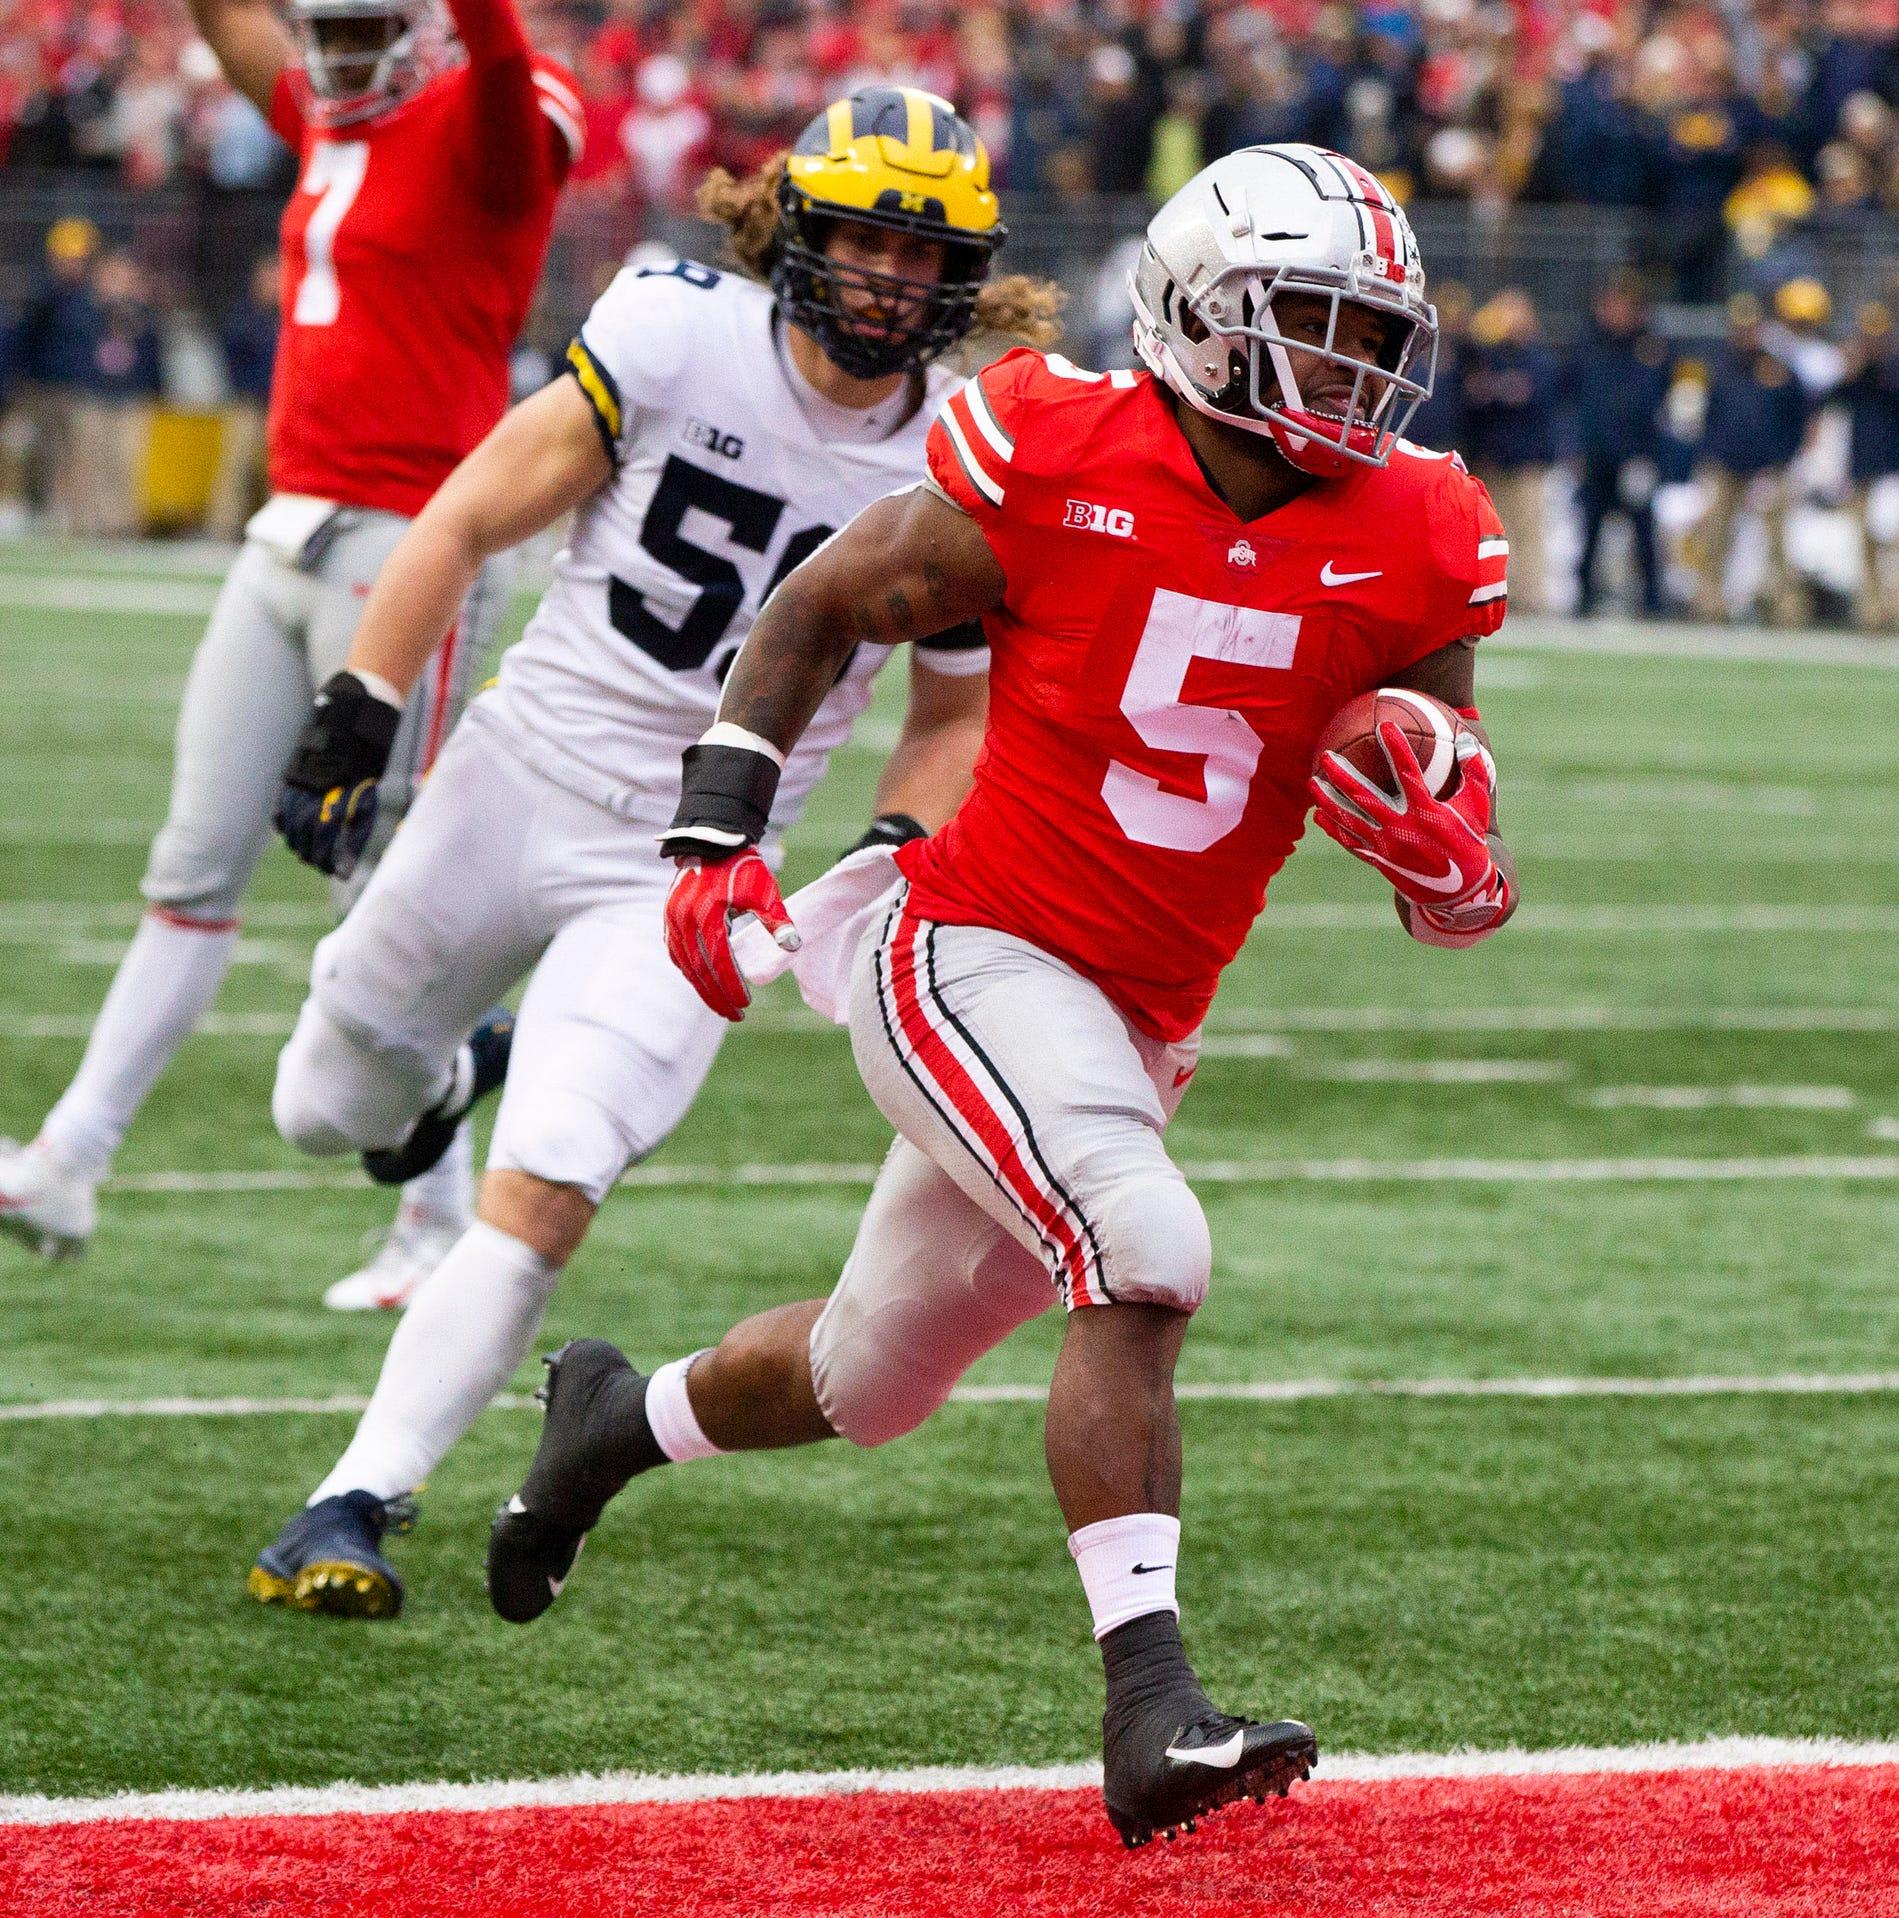 Ohio State running back Mike Weber (5) scores against Michigan linebacker Noah Furbush (59) on Saturday, Nov. 24, 2018, at Ohio Stadium.